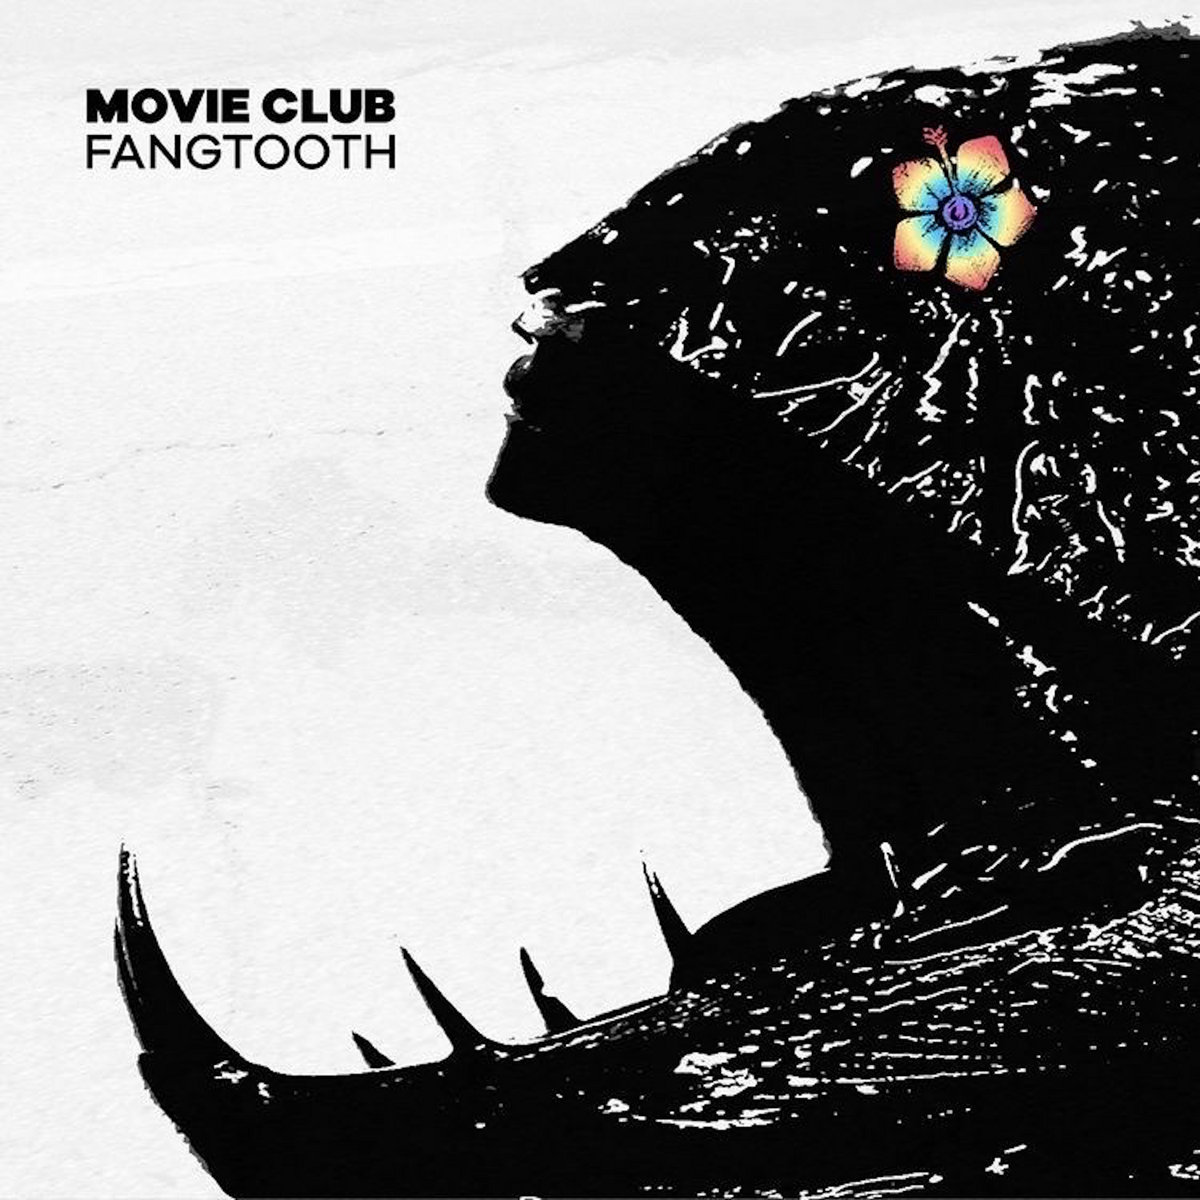 Movie Club - Fangtooth